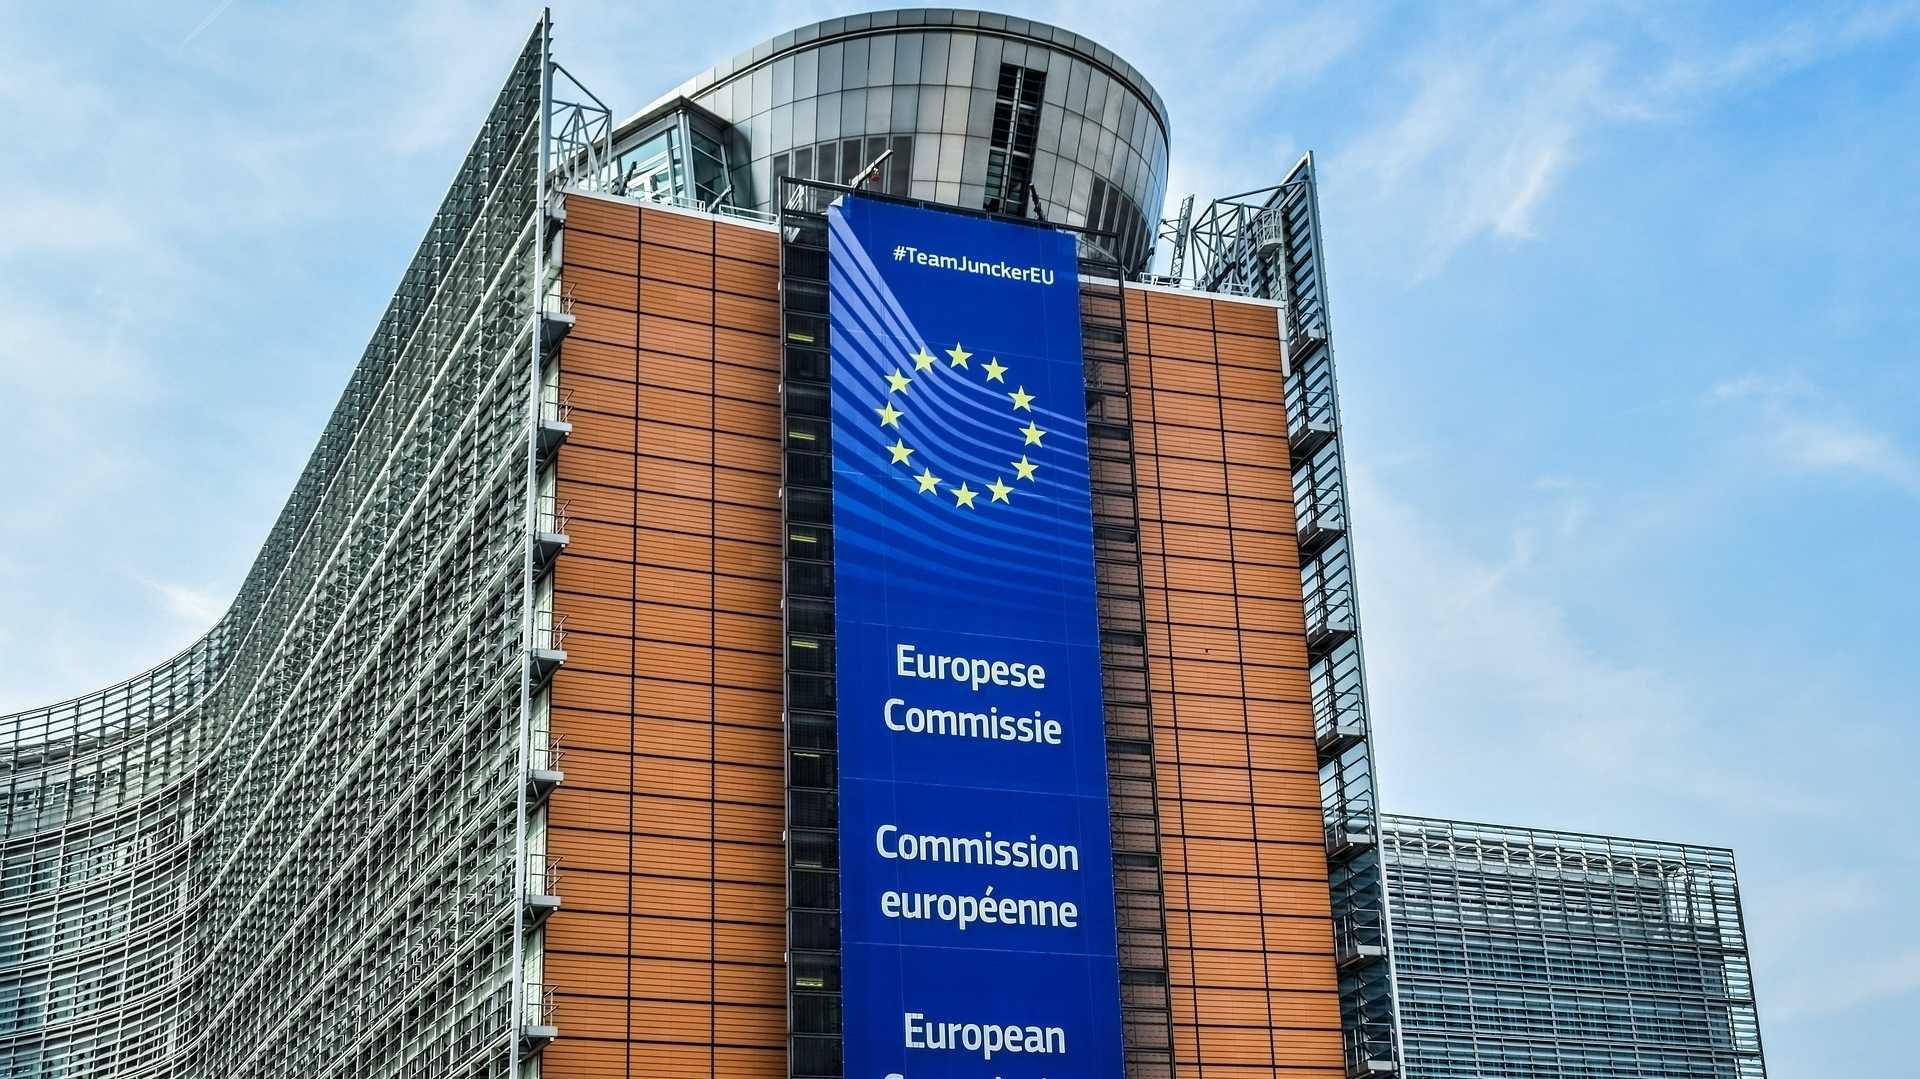 Ermittler-Zugriff auf Providerdaten: Kritik an EU-Kommission